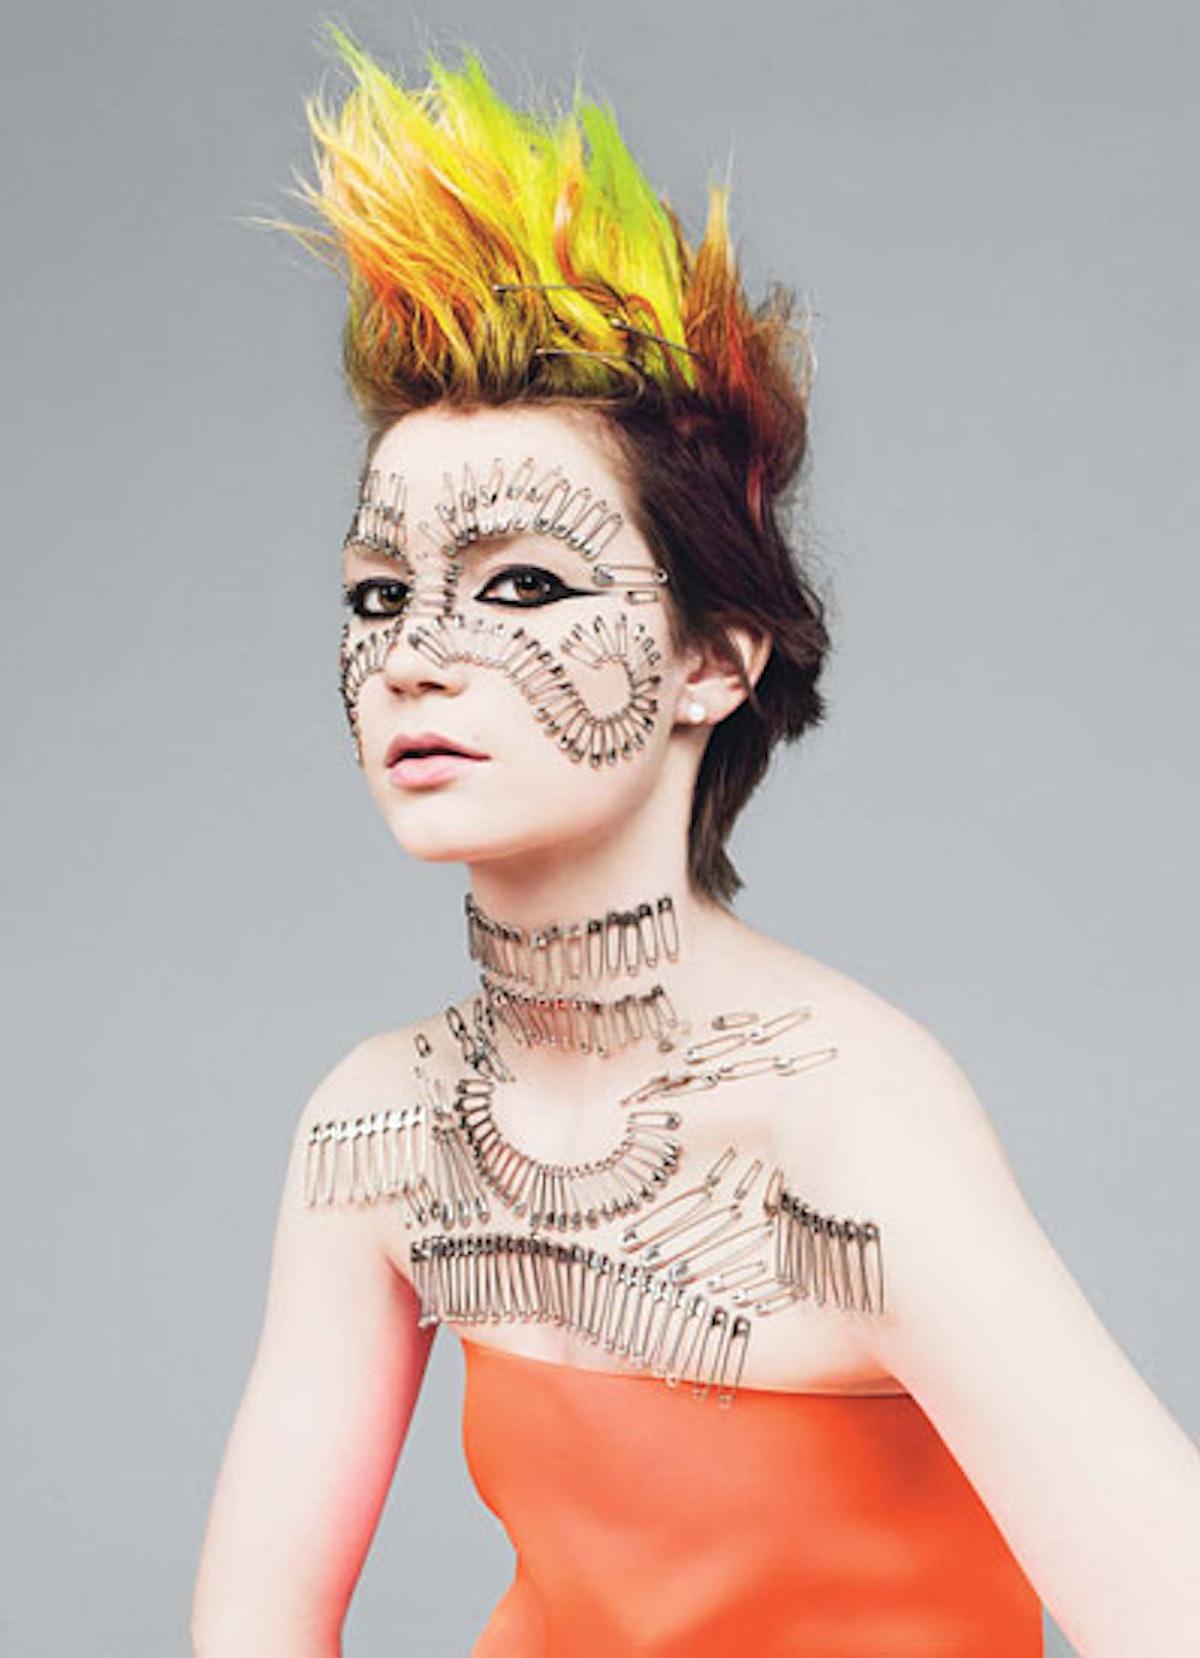 fass-mia-wasikowska-punk-04-v.jpg